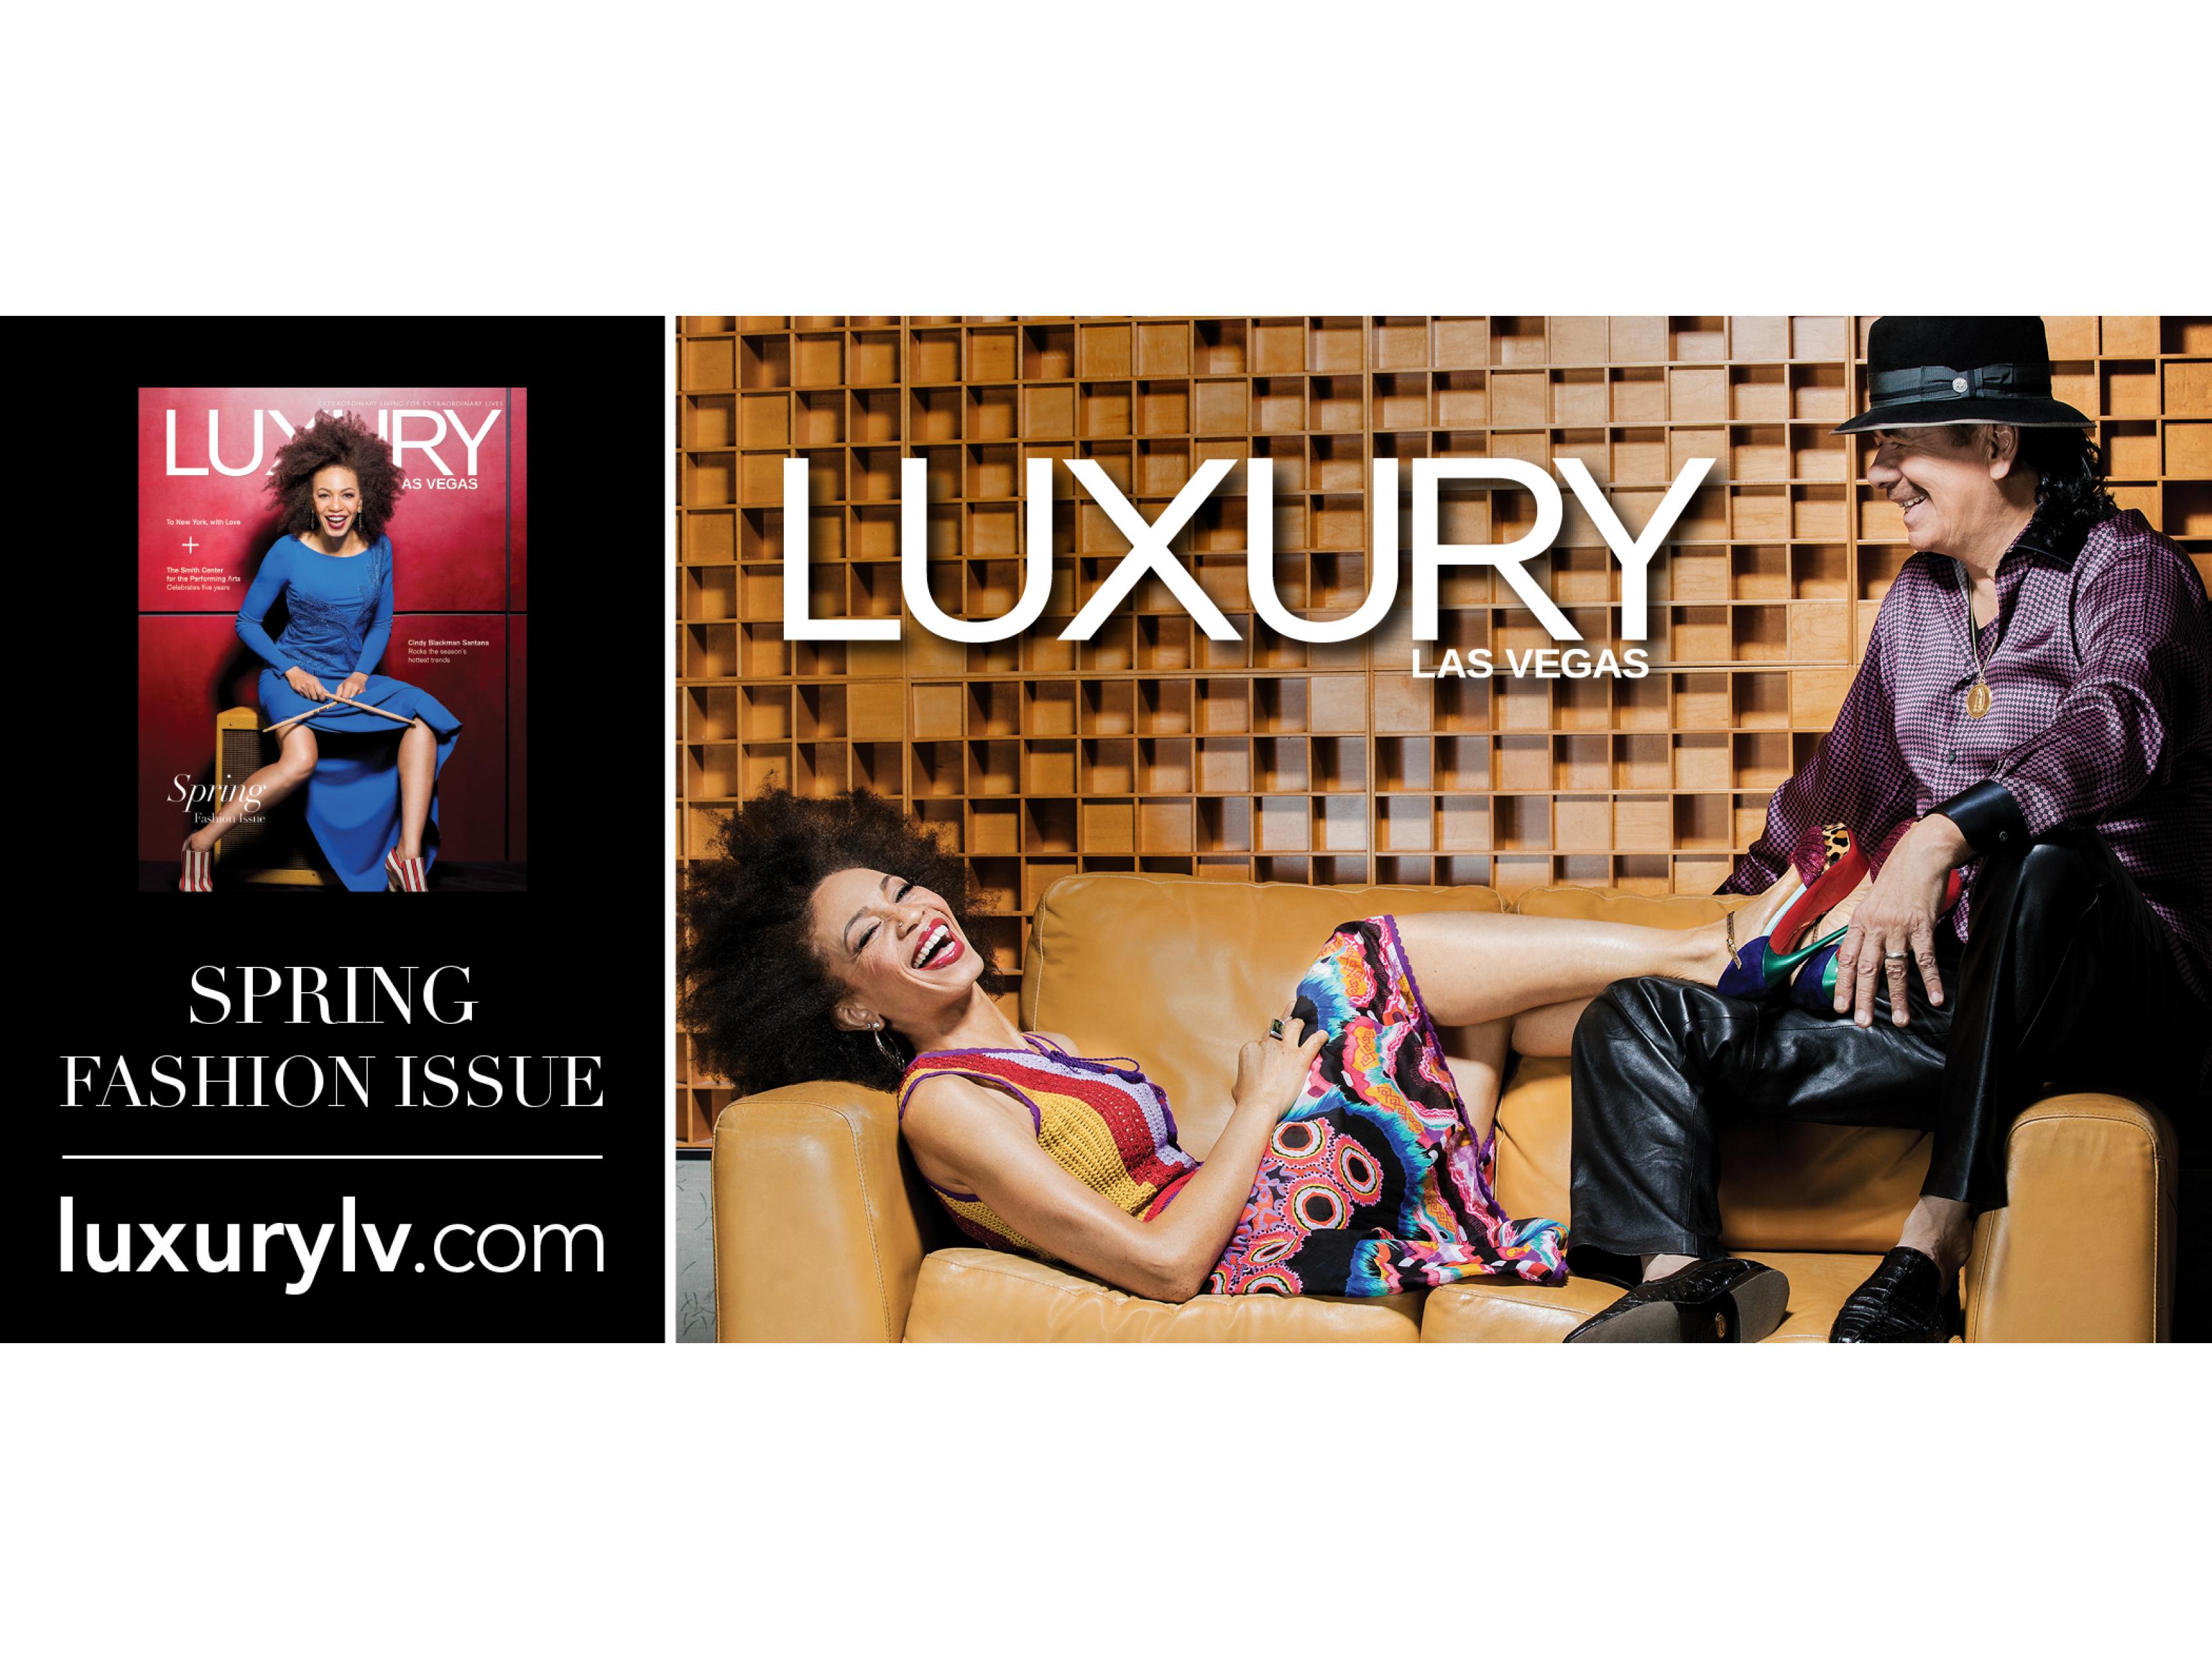 Luxury Las Vegas - Billboard